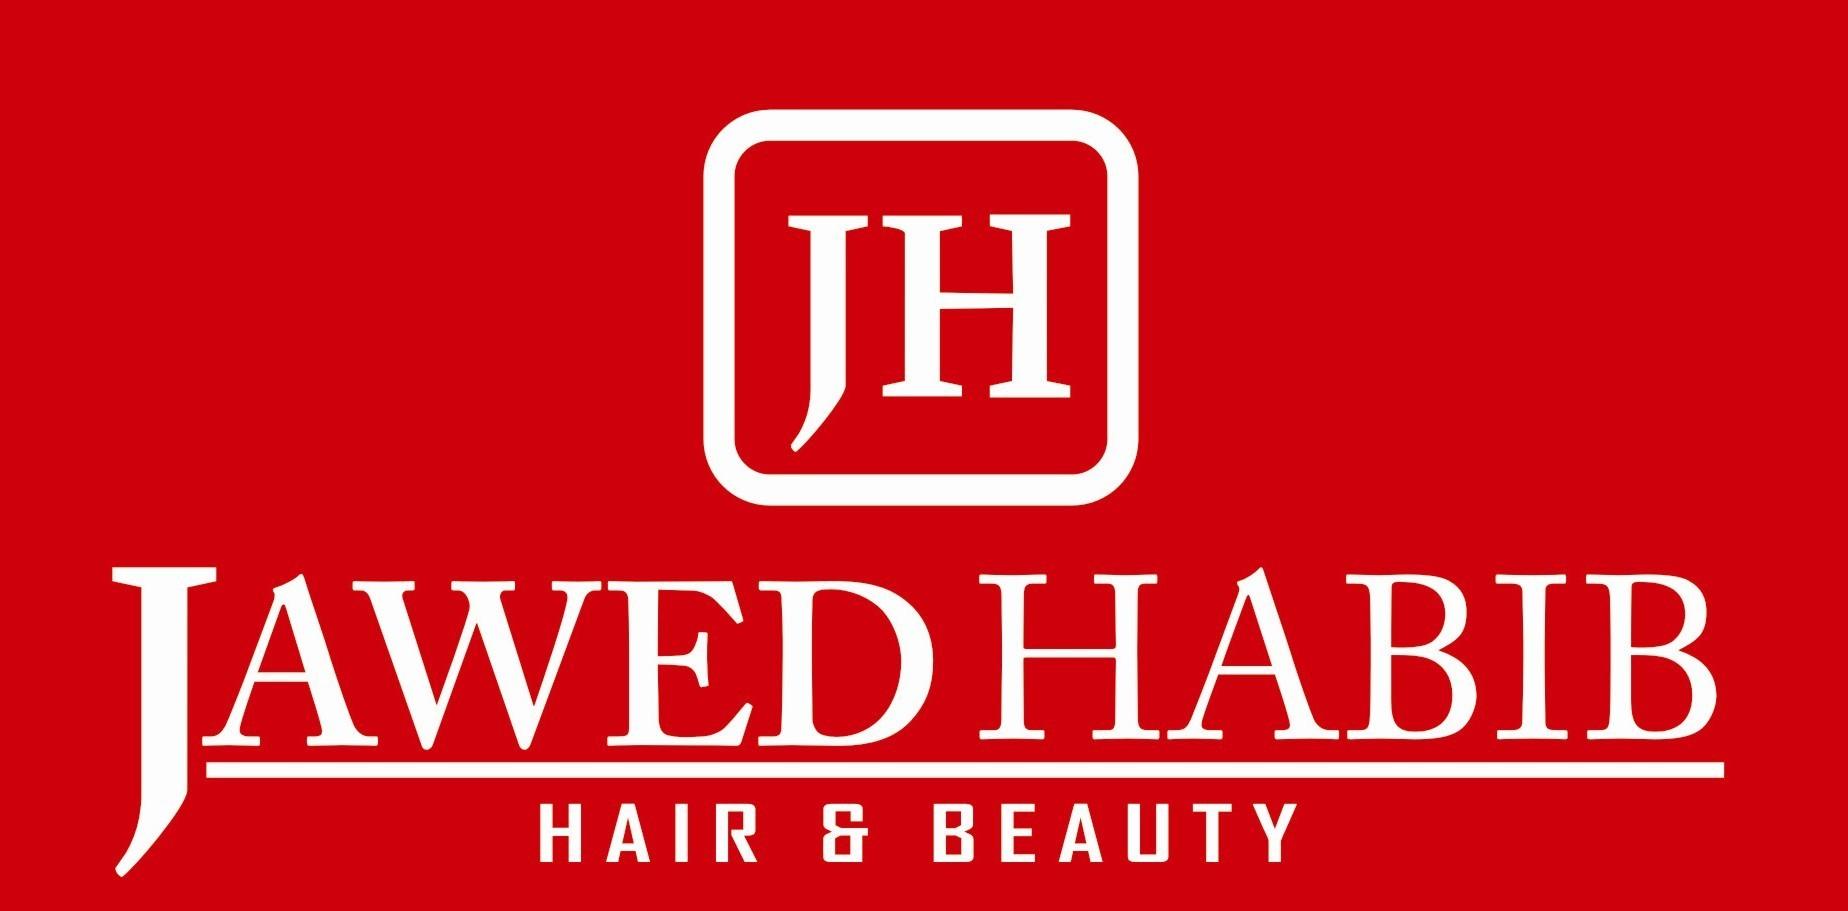 Jawed Habib Hair & Beauty Salons - Miyapur Main Road - Hyderabad Image